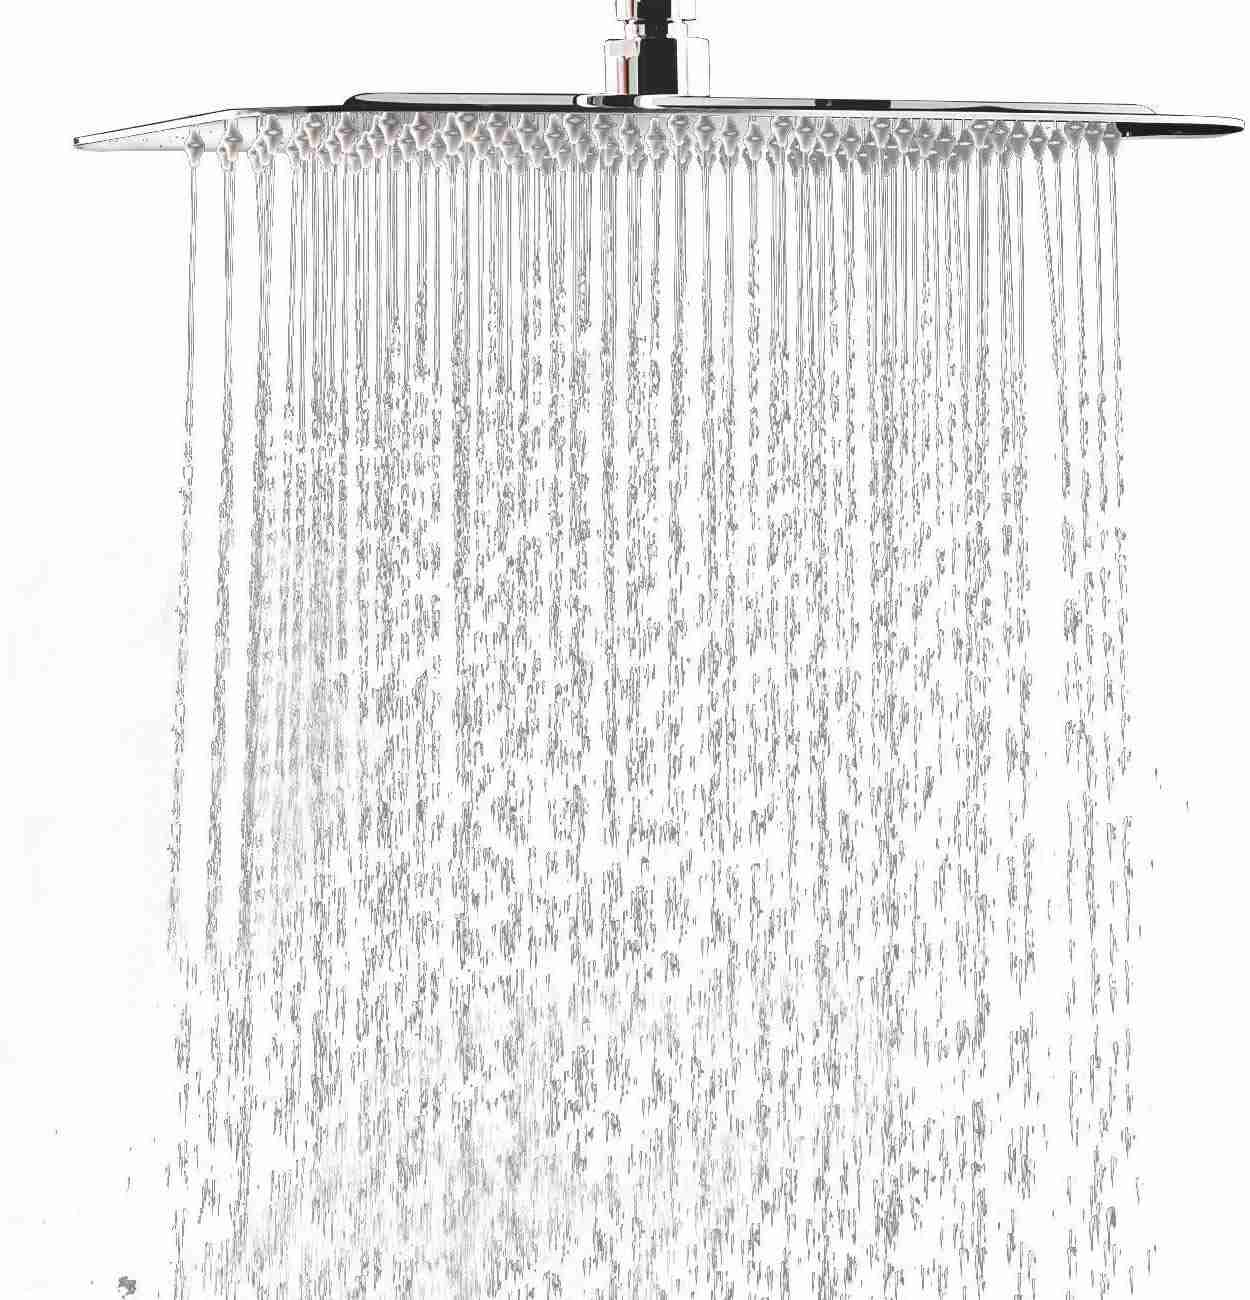 Derpras Square Rain Shower Head 304 Stainless Steel Ultra Thin Powerful High...